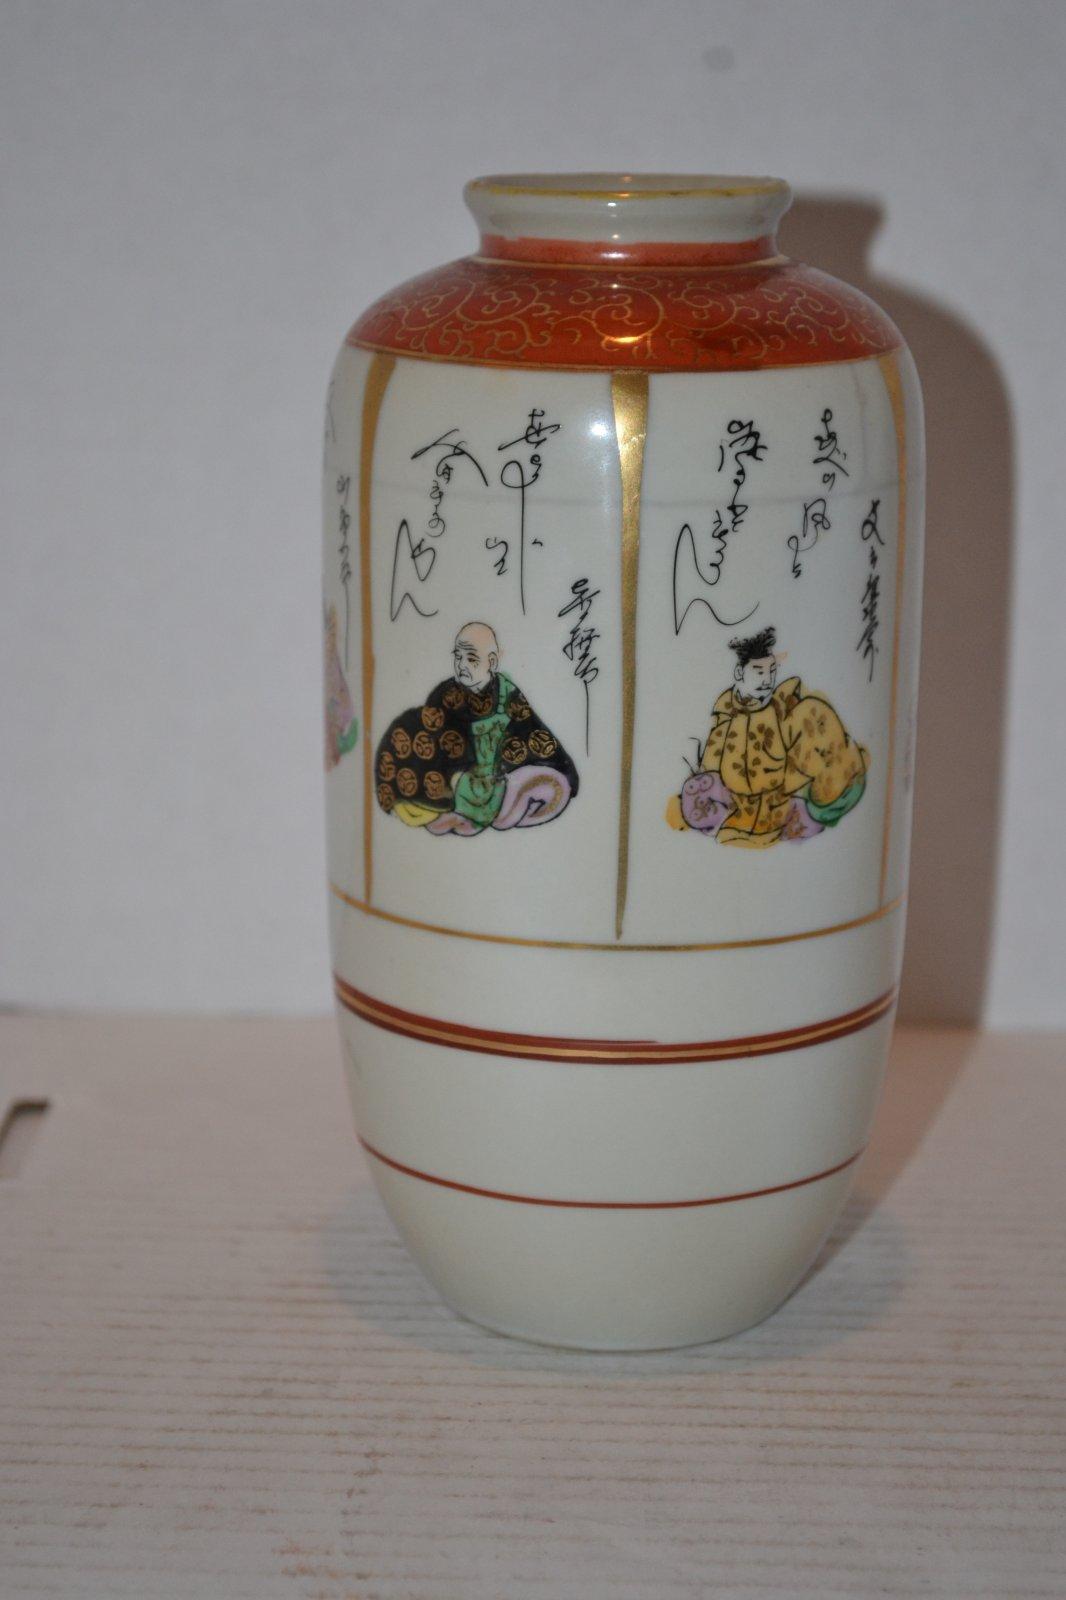 20th Century Japanese Vase w/ people sitting, orange/brown around rim H. 7 X W. 3.5